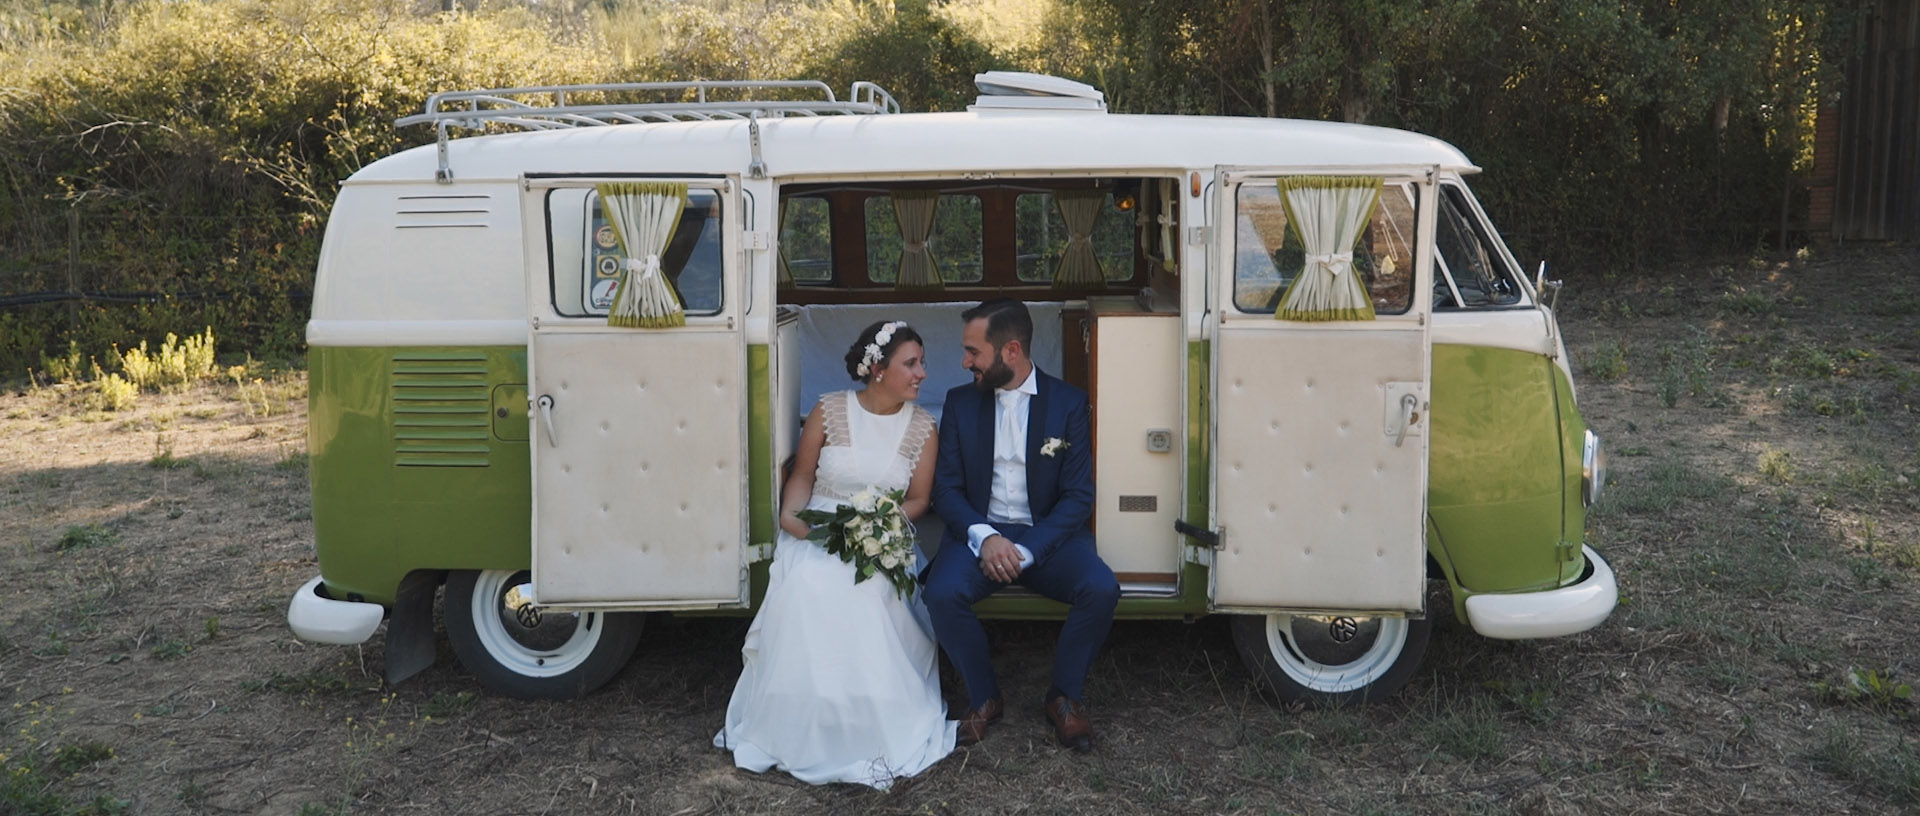 Melanie & Valter – Wedding